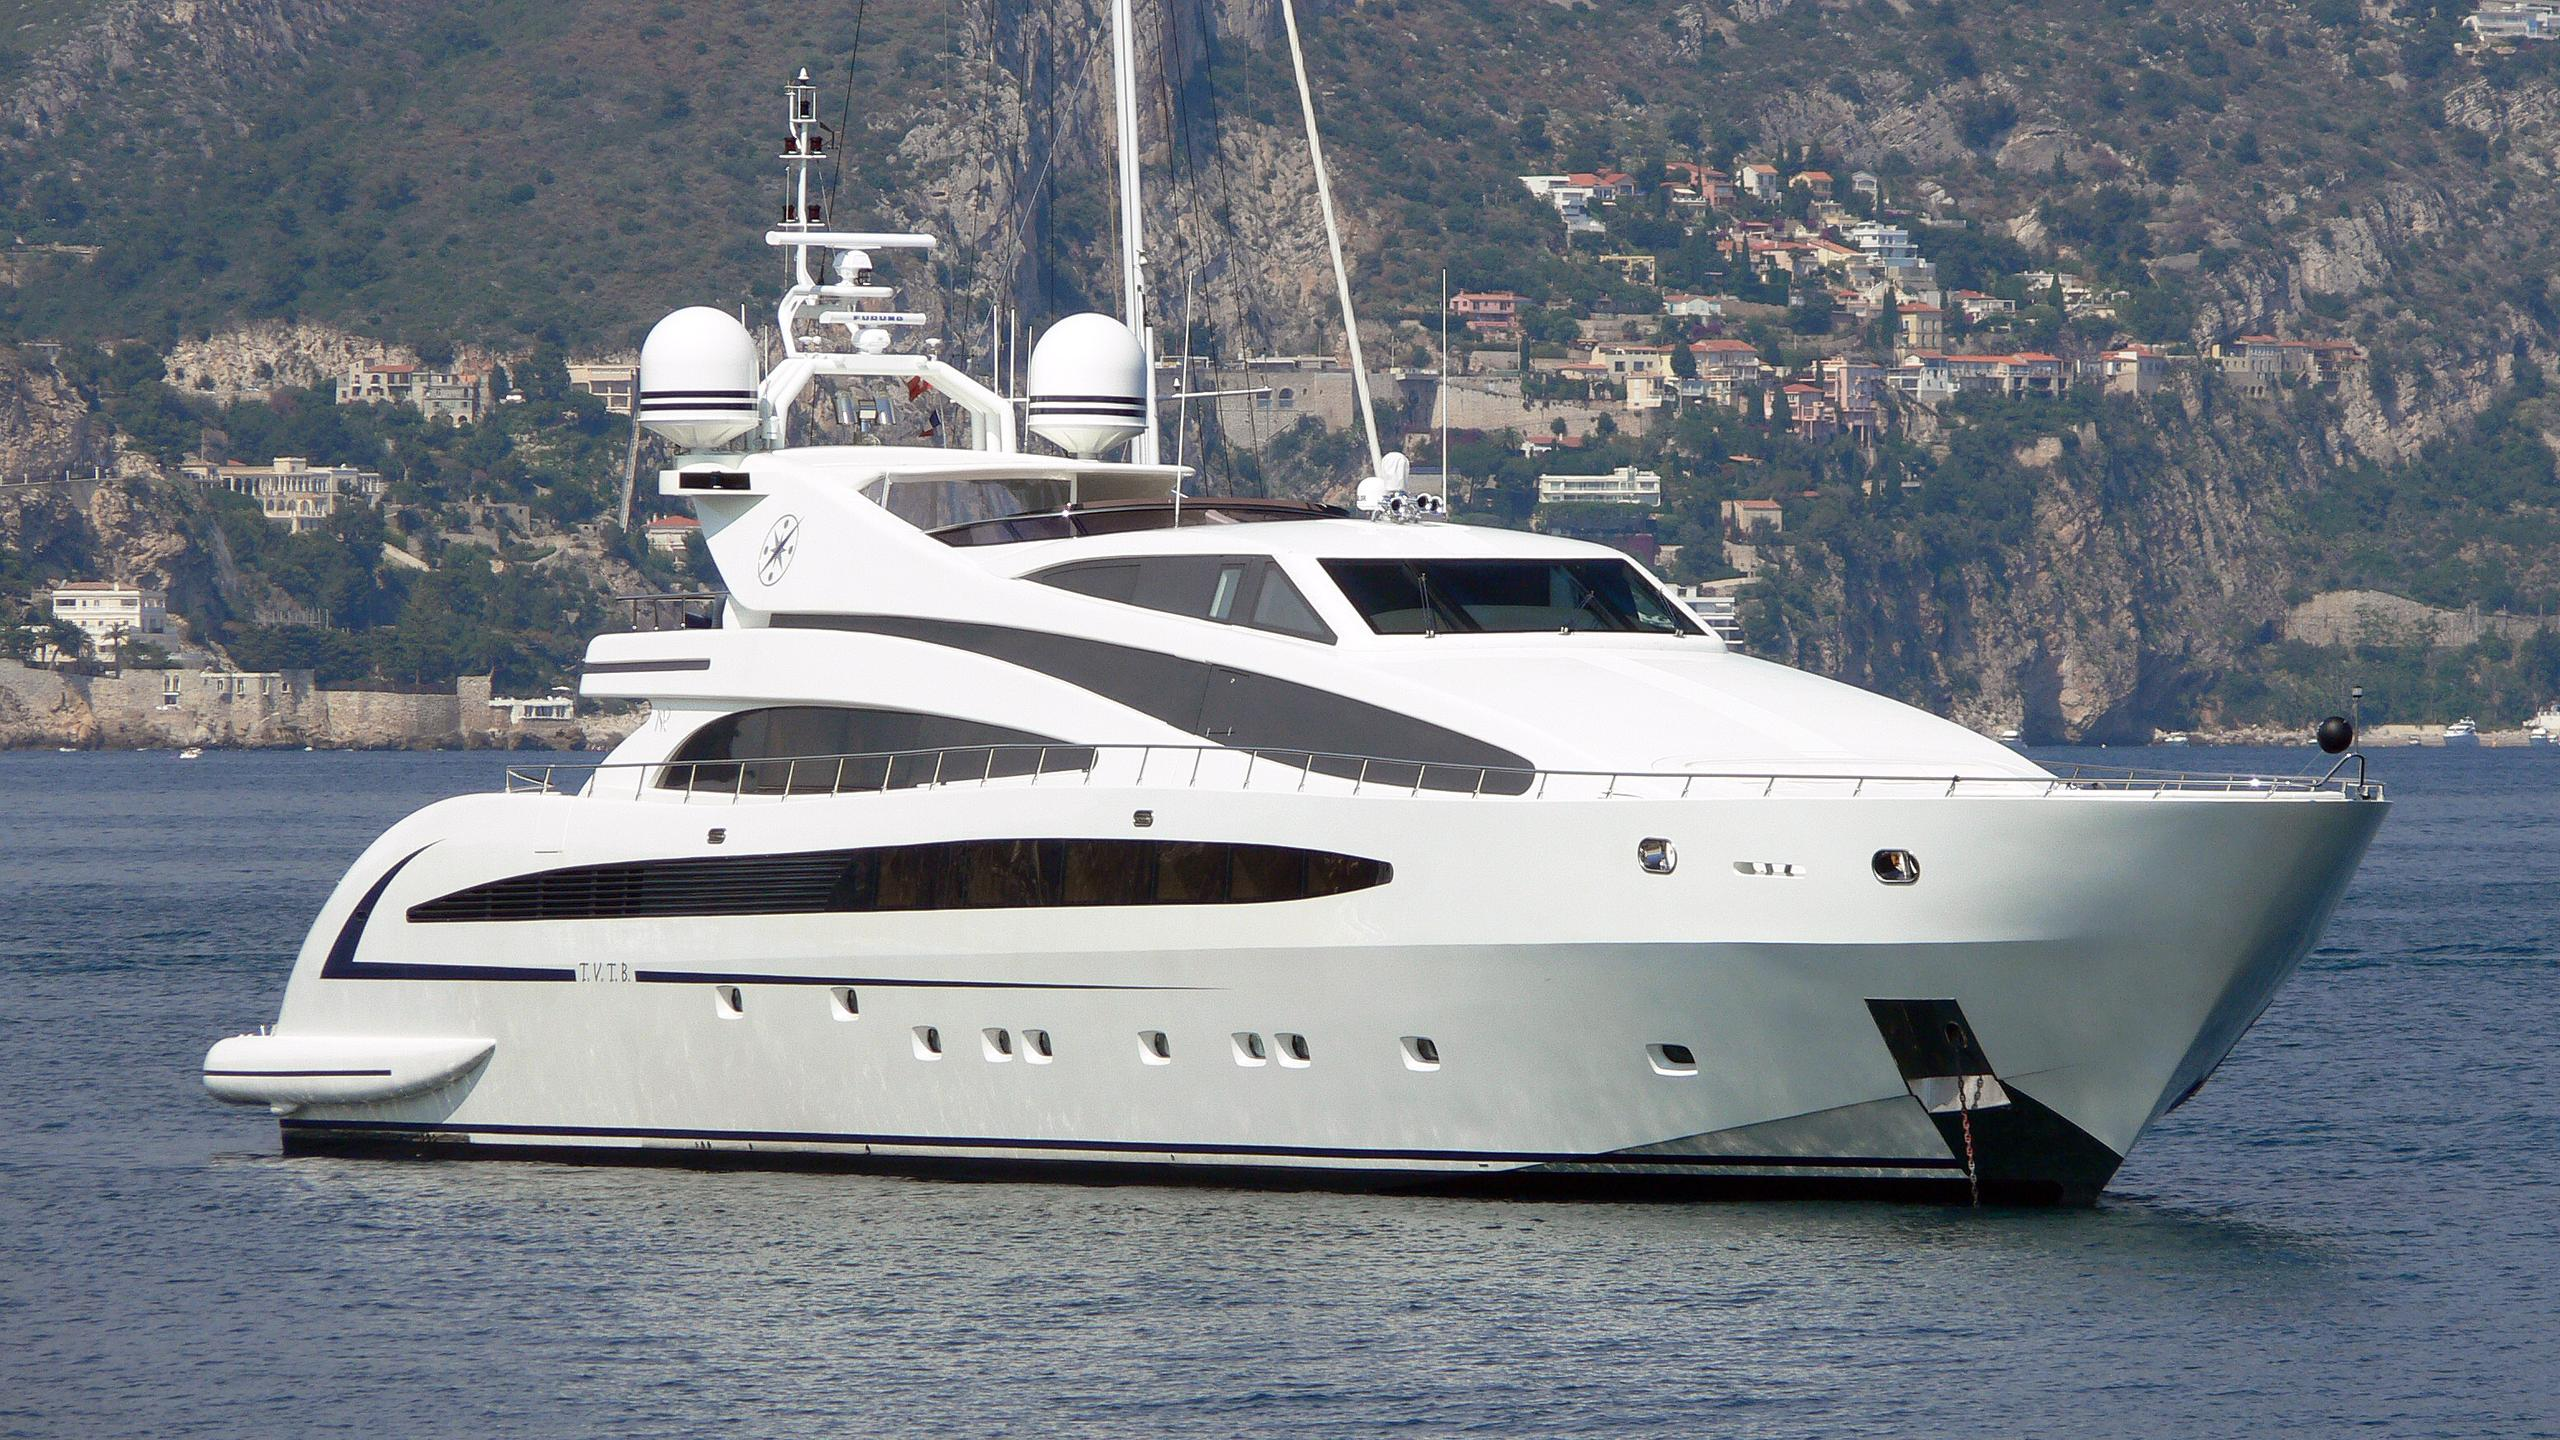 liberdade-motor-yacht-isa-136-2007-41m-half-profile